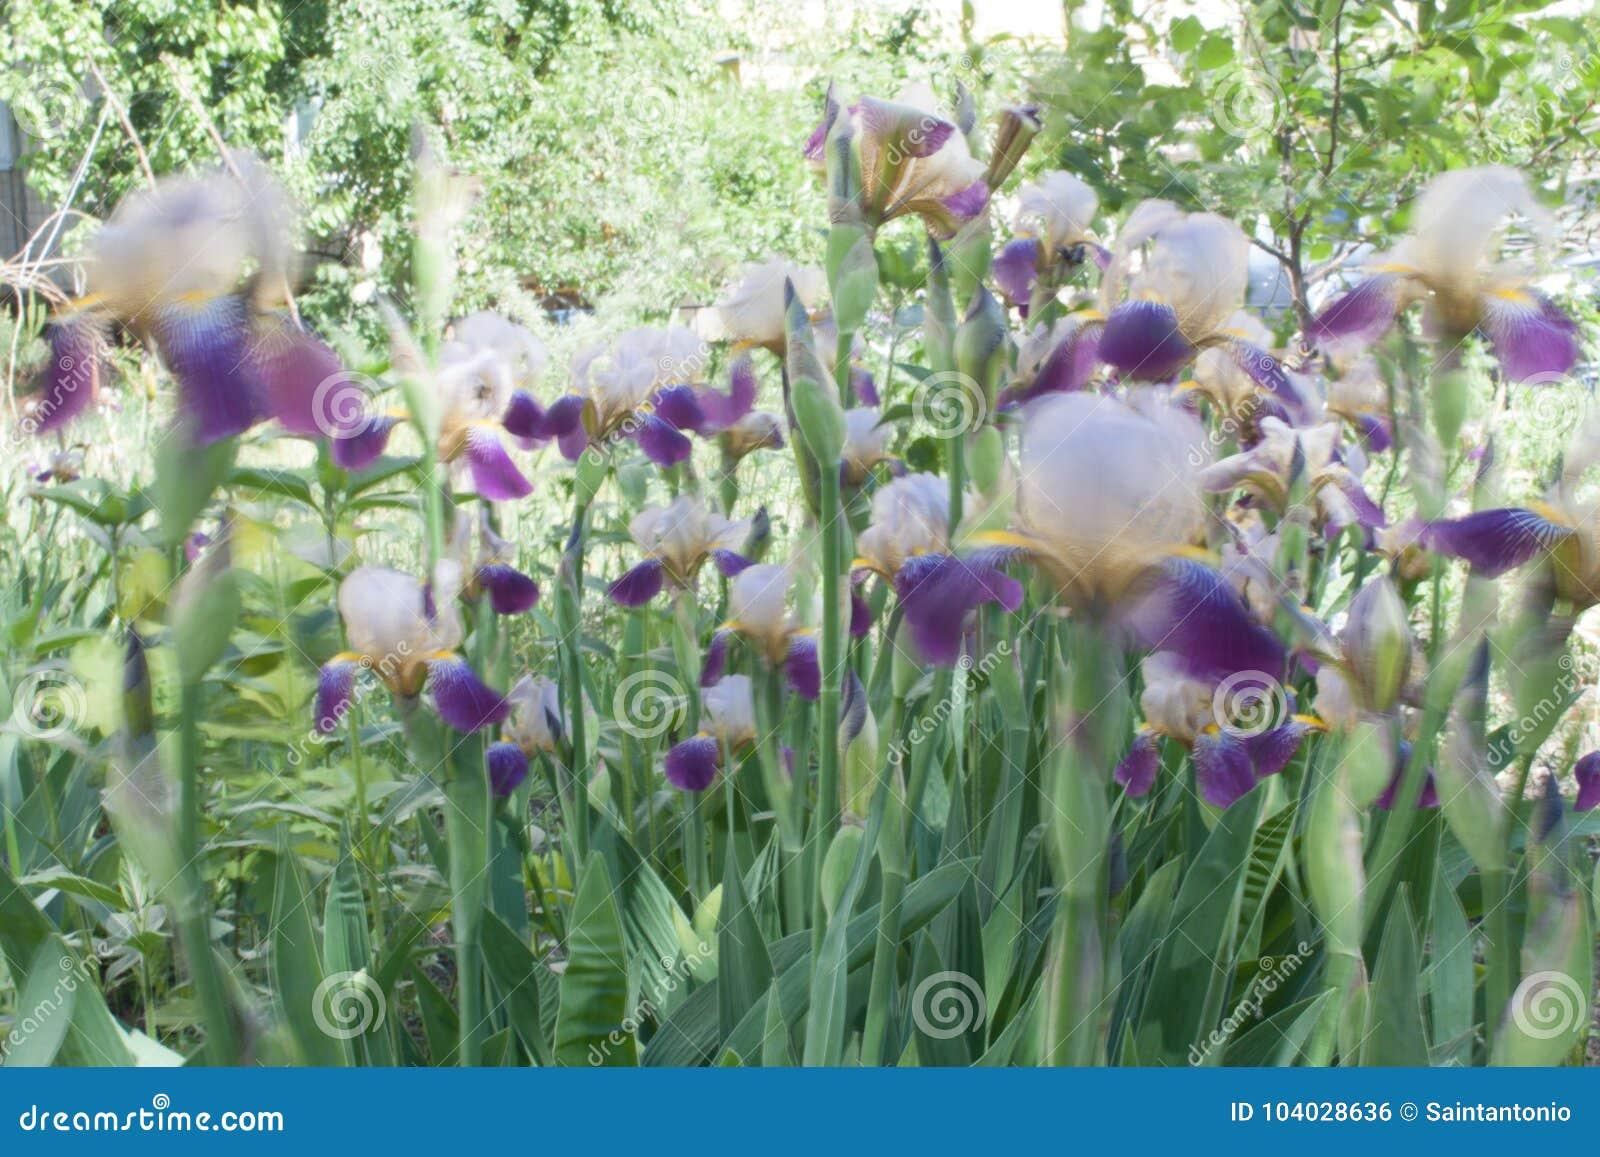 Iris flower in bloom natural colorful background stock photo download iris flower in bloom natural colorful background stock photo image of flower izmirmasajfo